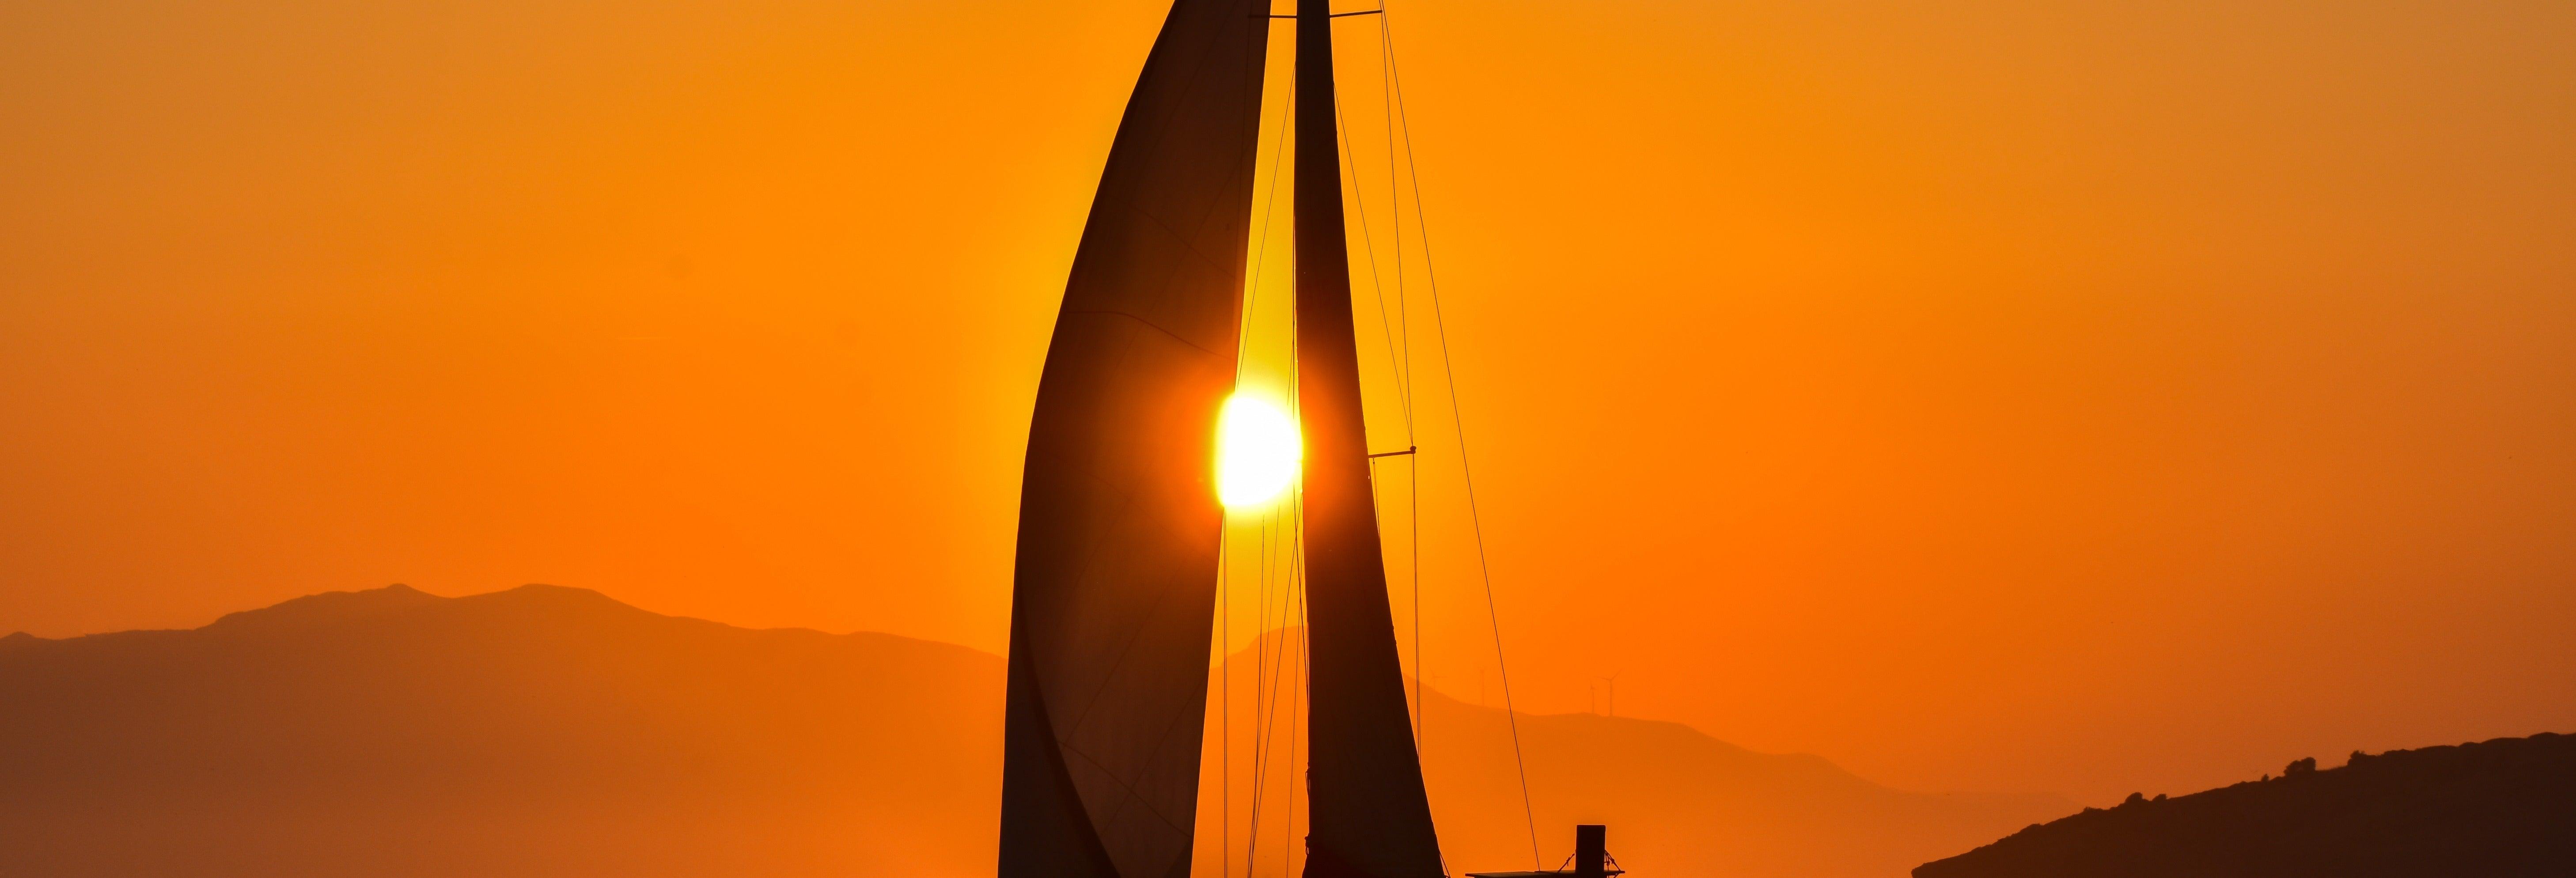 Sunset Boat Cruise in Arrabida